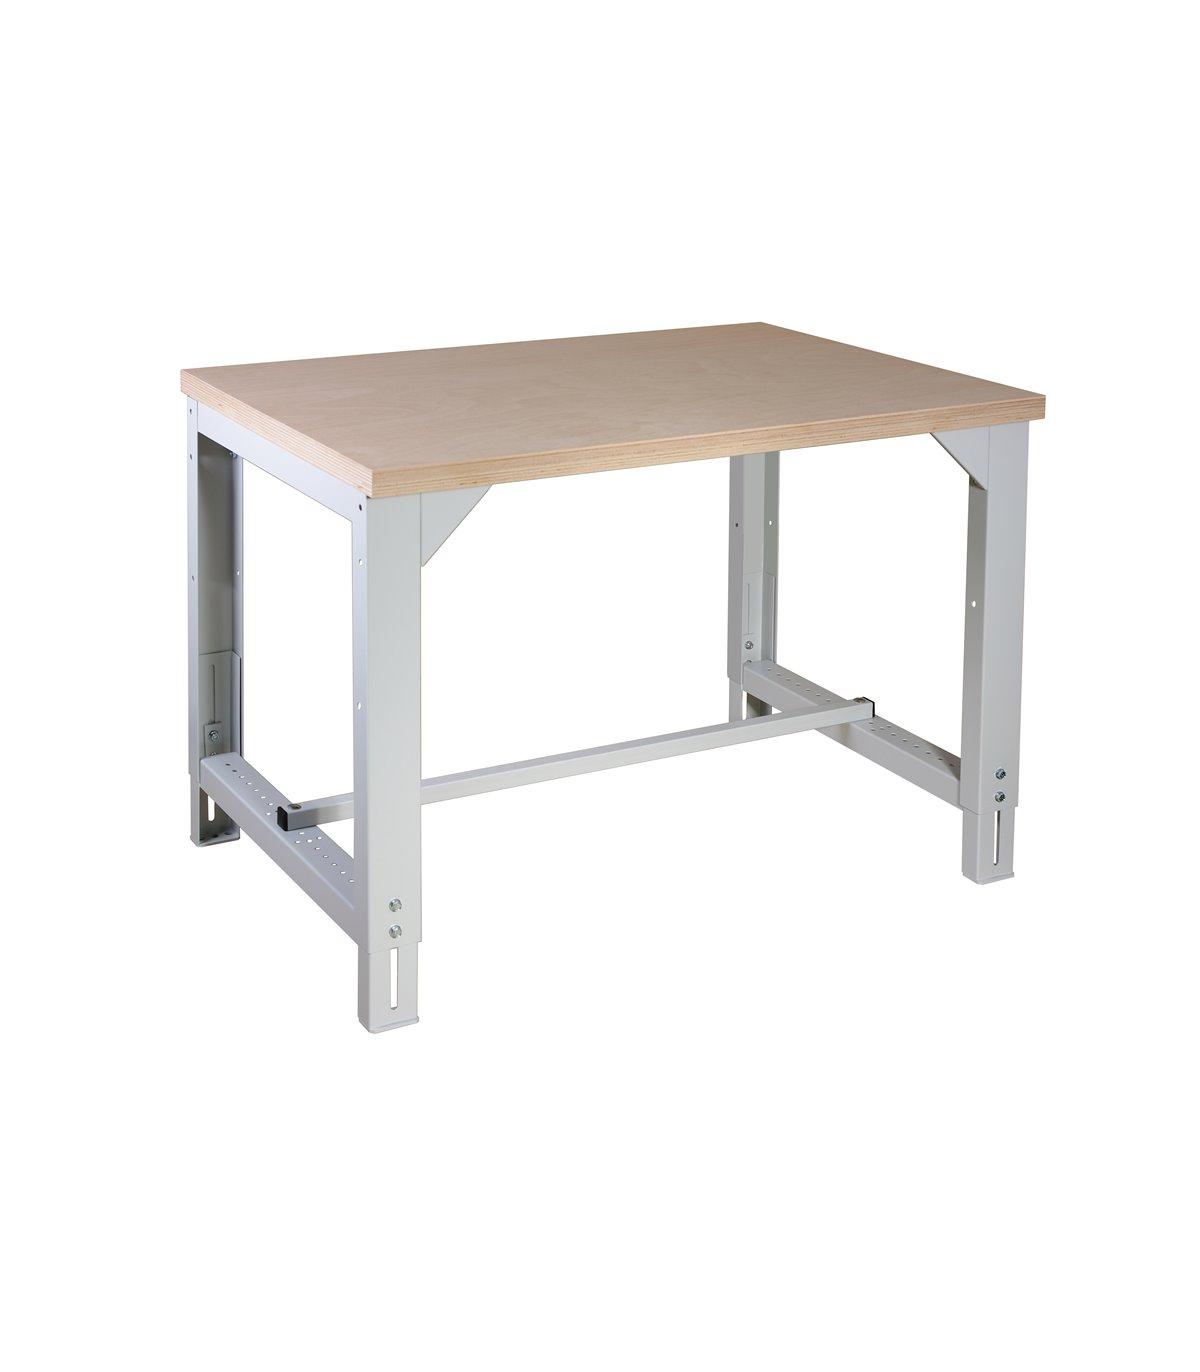 Table-établi réglable en hauteur sans tiroir